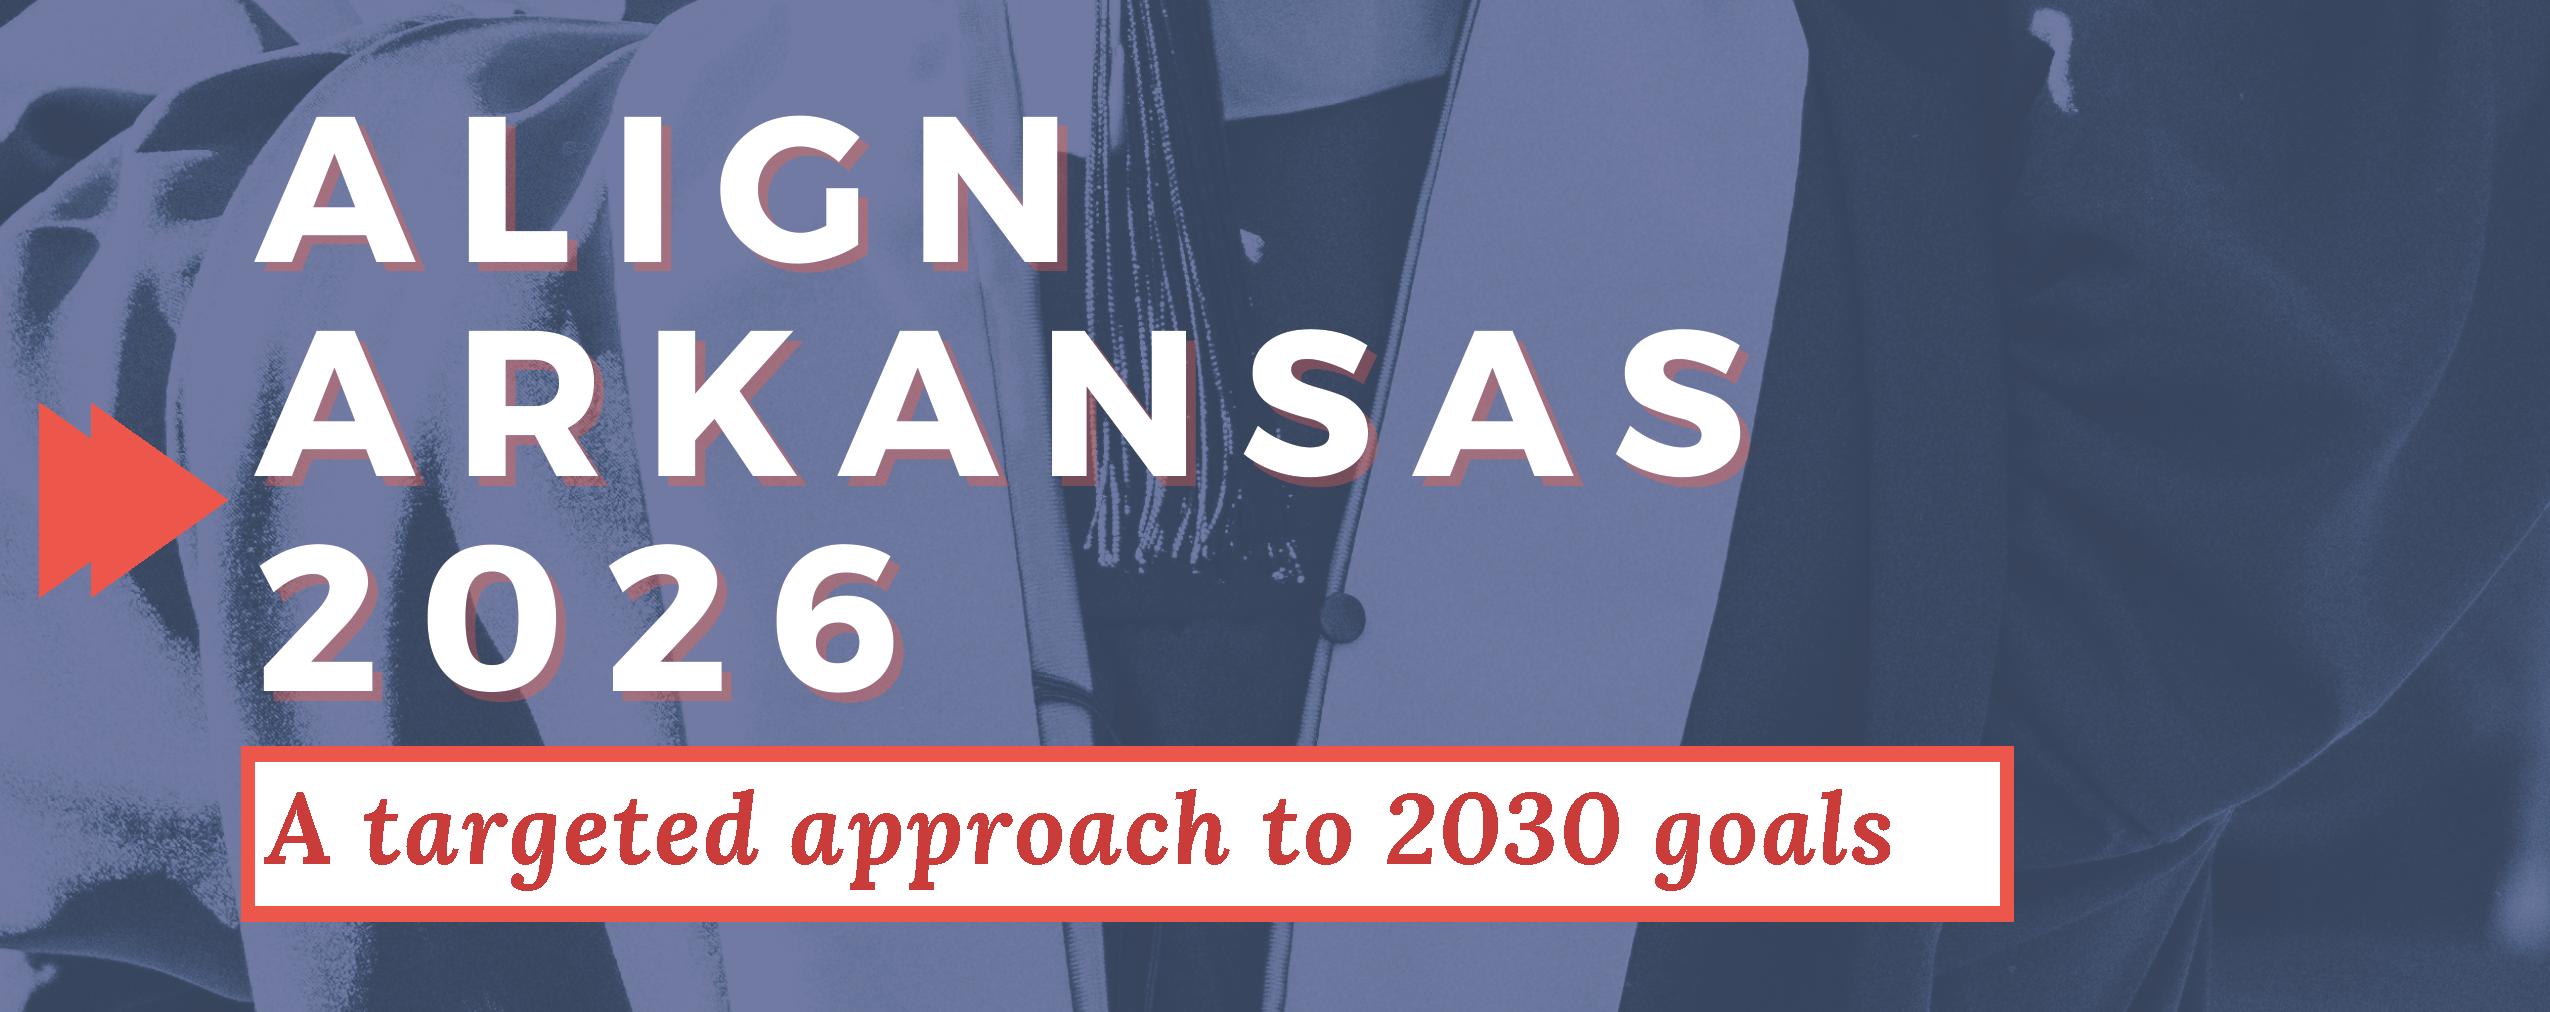 Align Arkansas 2026: A targeted approach to 2030 goals